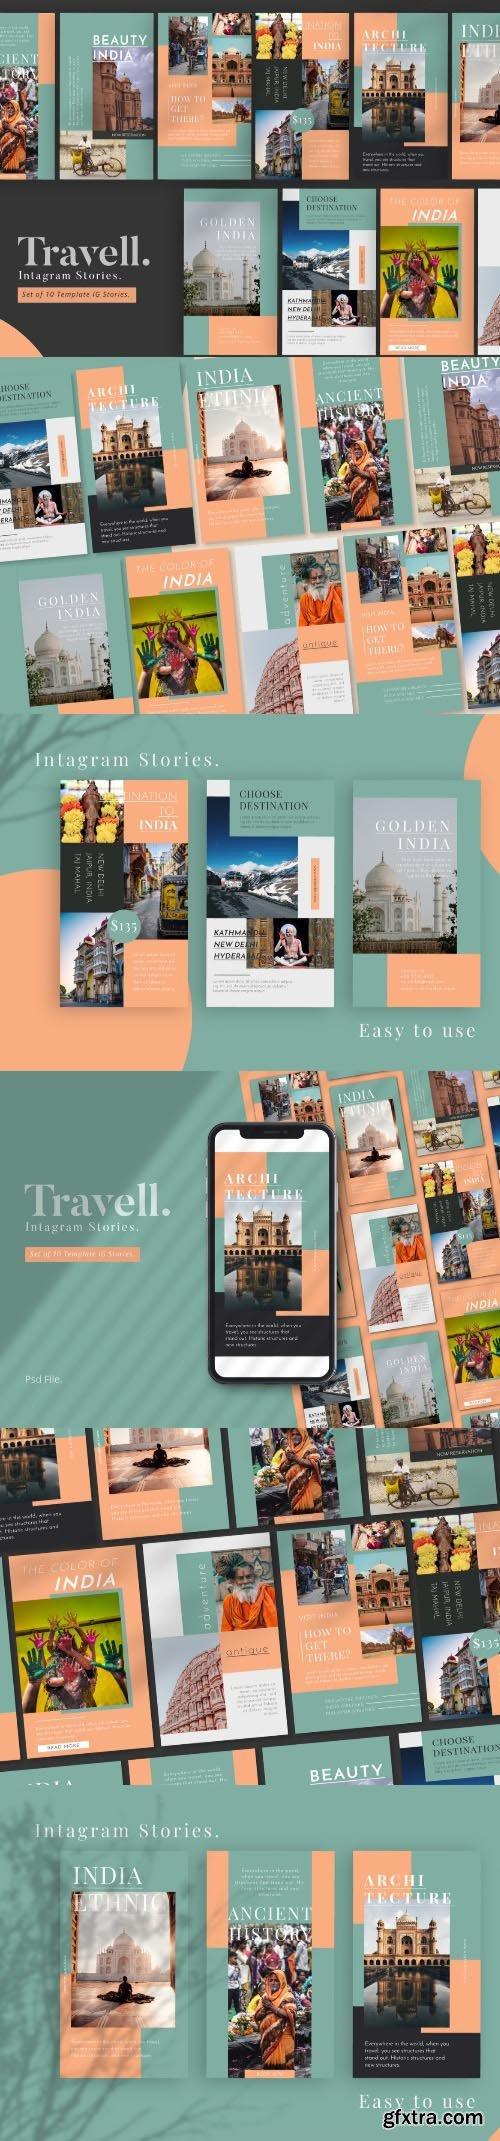 Travel Promotion Instagram Stories Templat